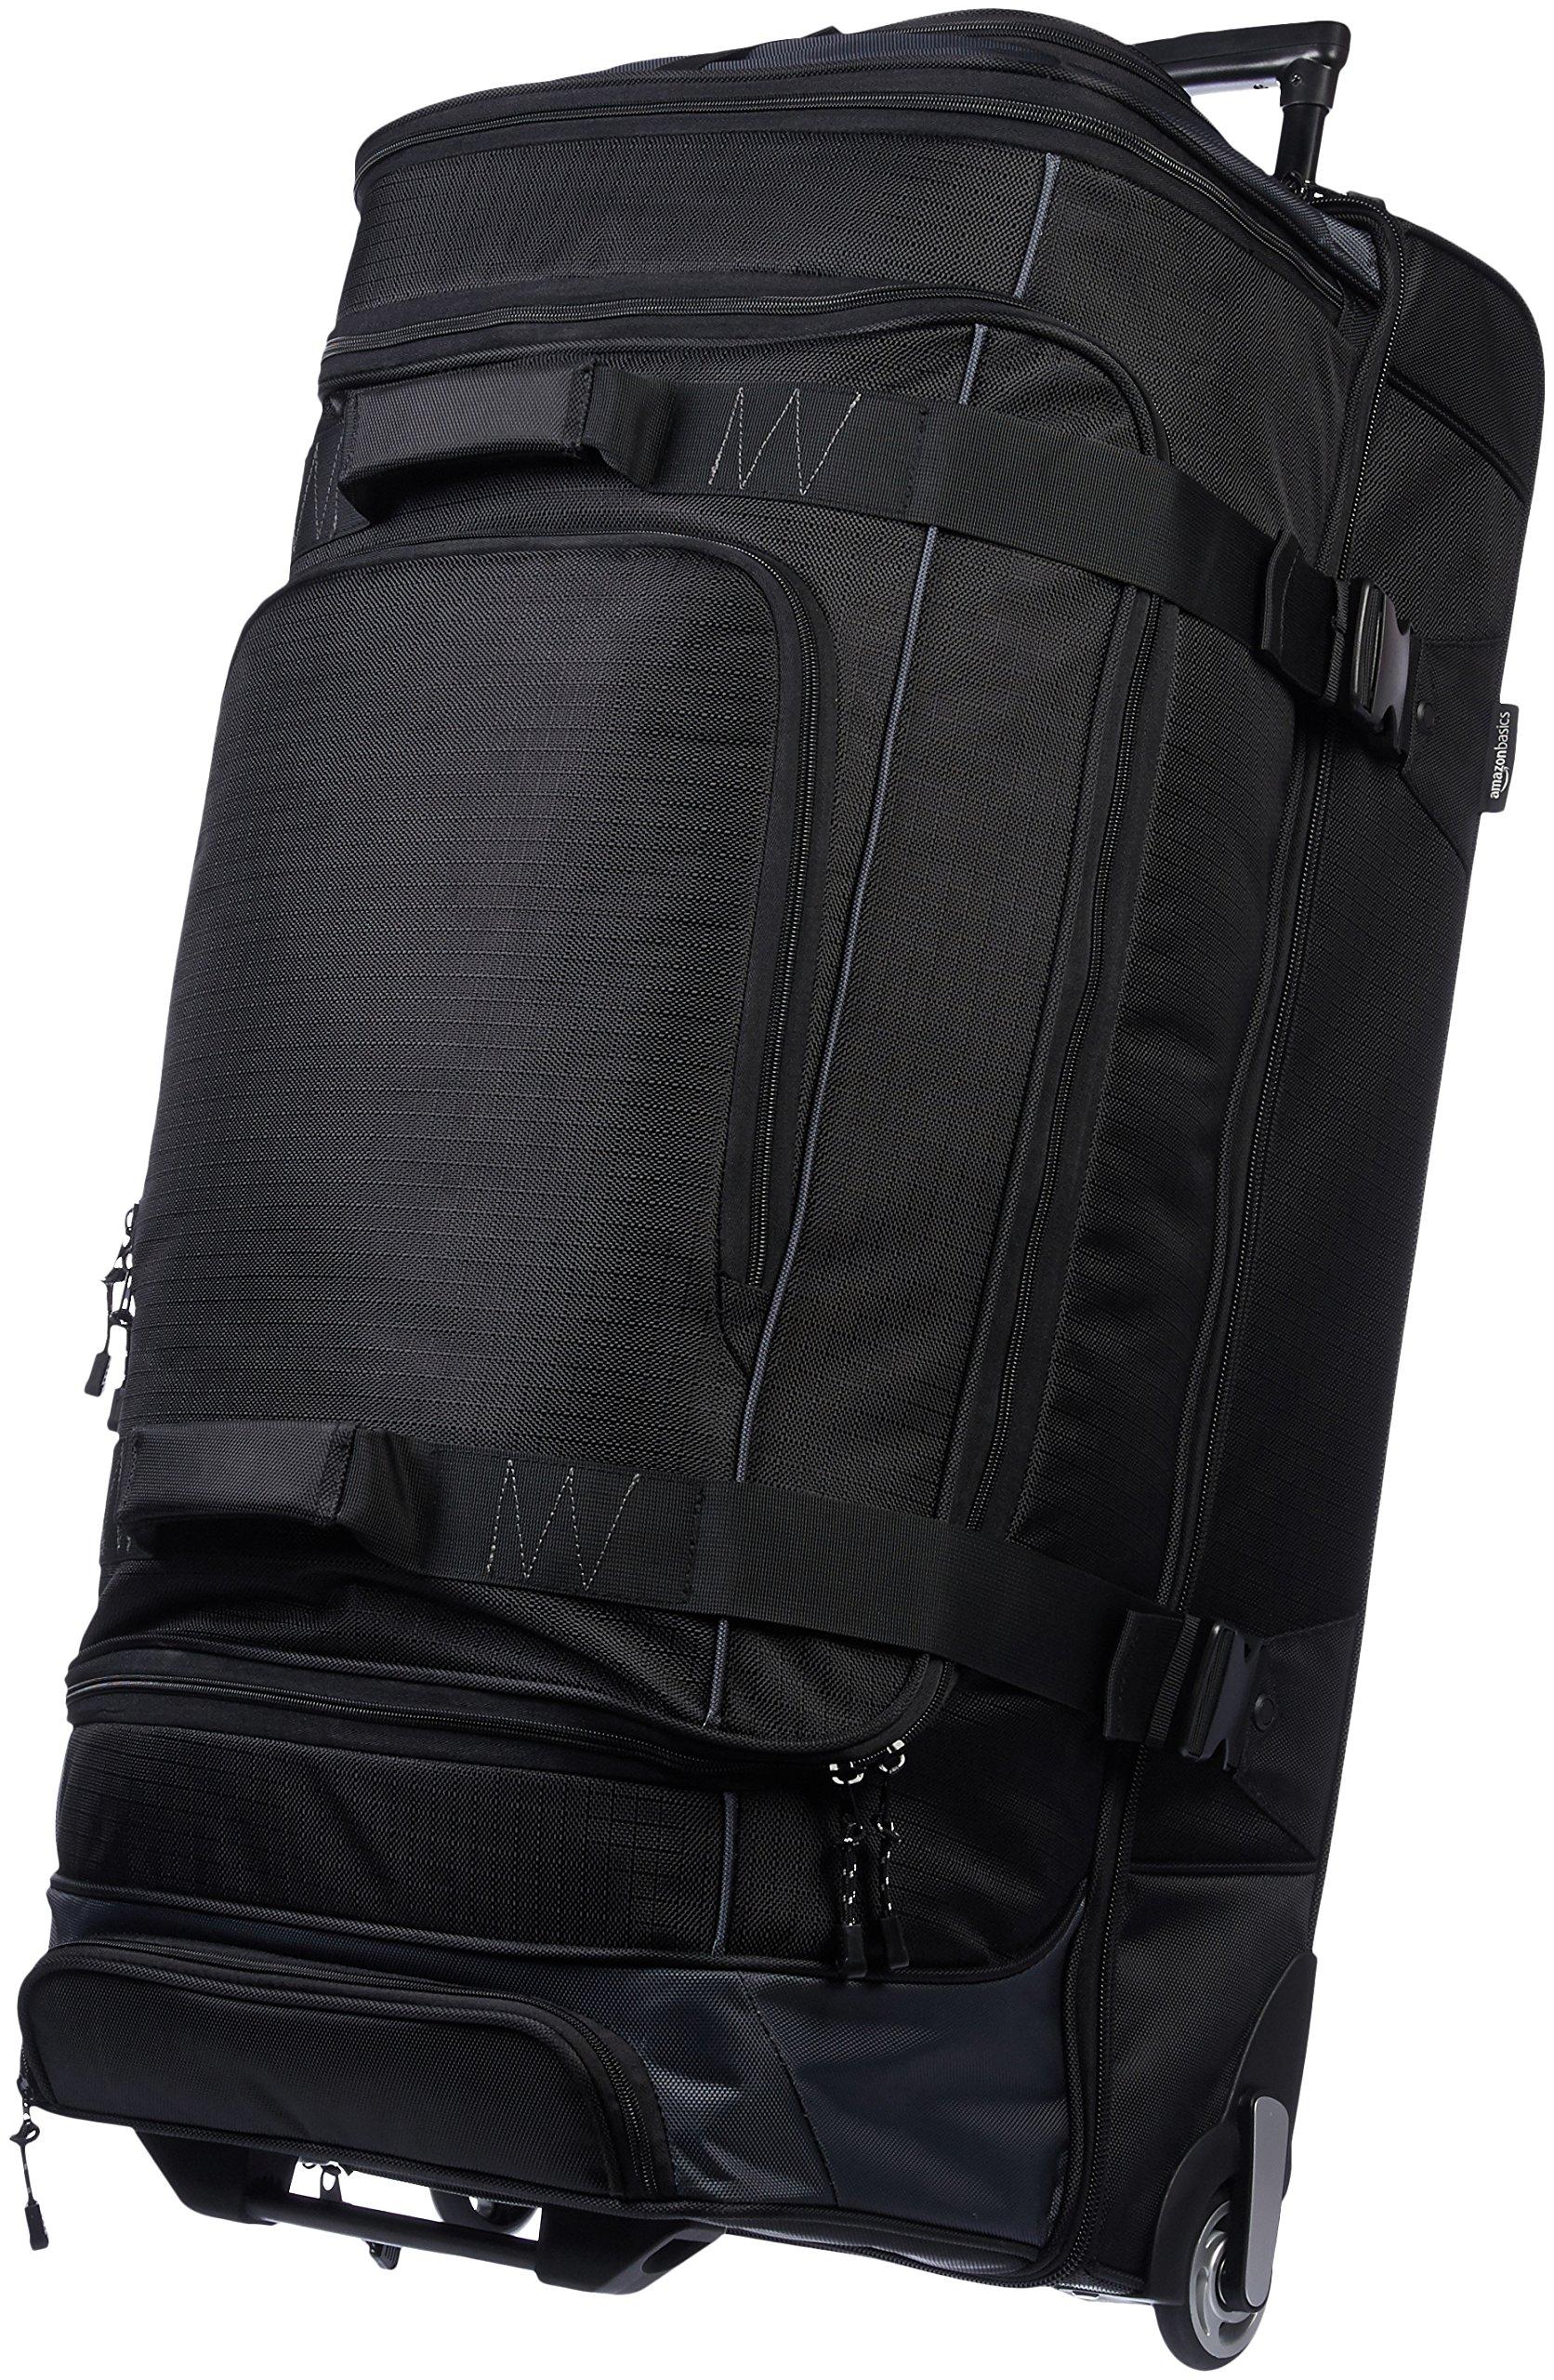 AmazonBasics Ripstop Rolling Travel Luggage